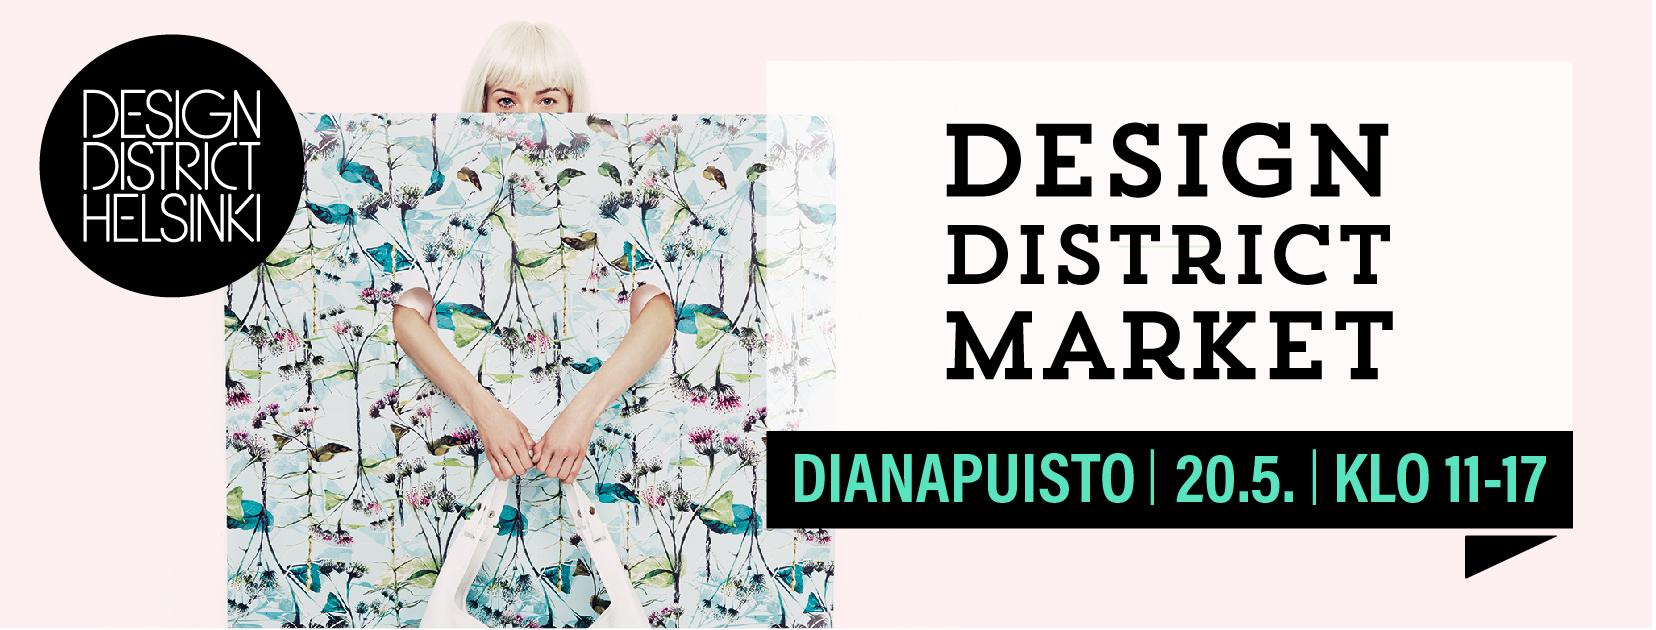 Galleria Mafka&Alakoski Design District Market 2017